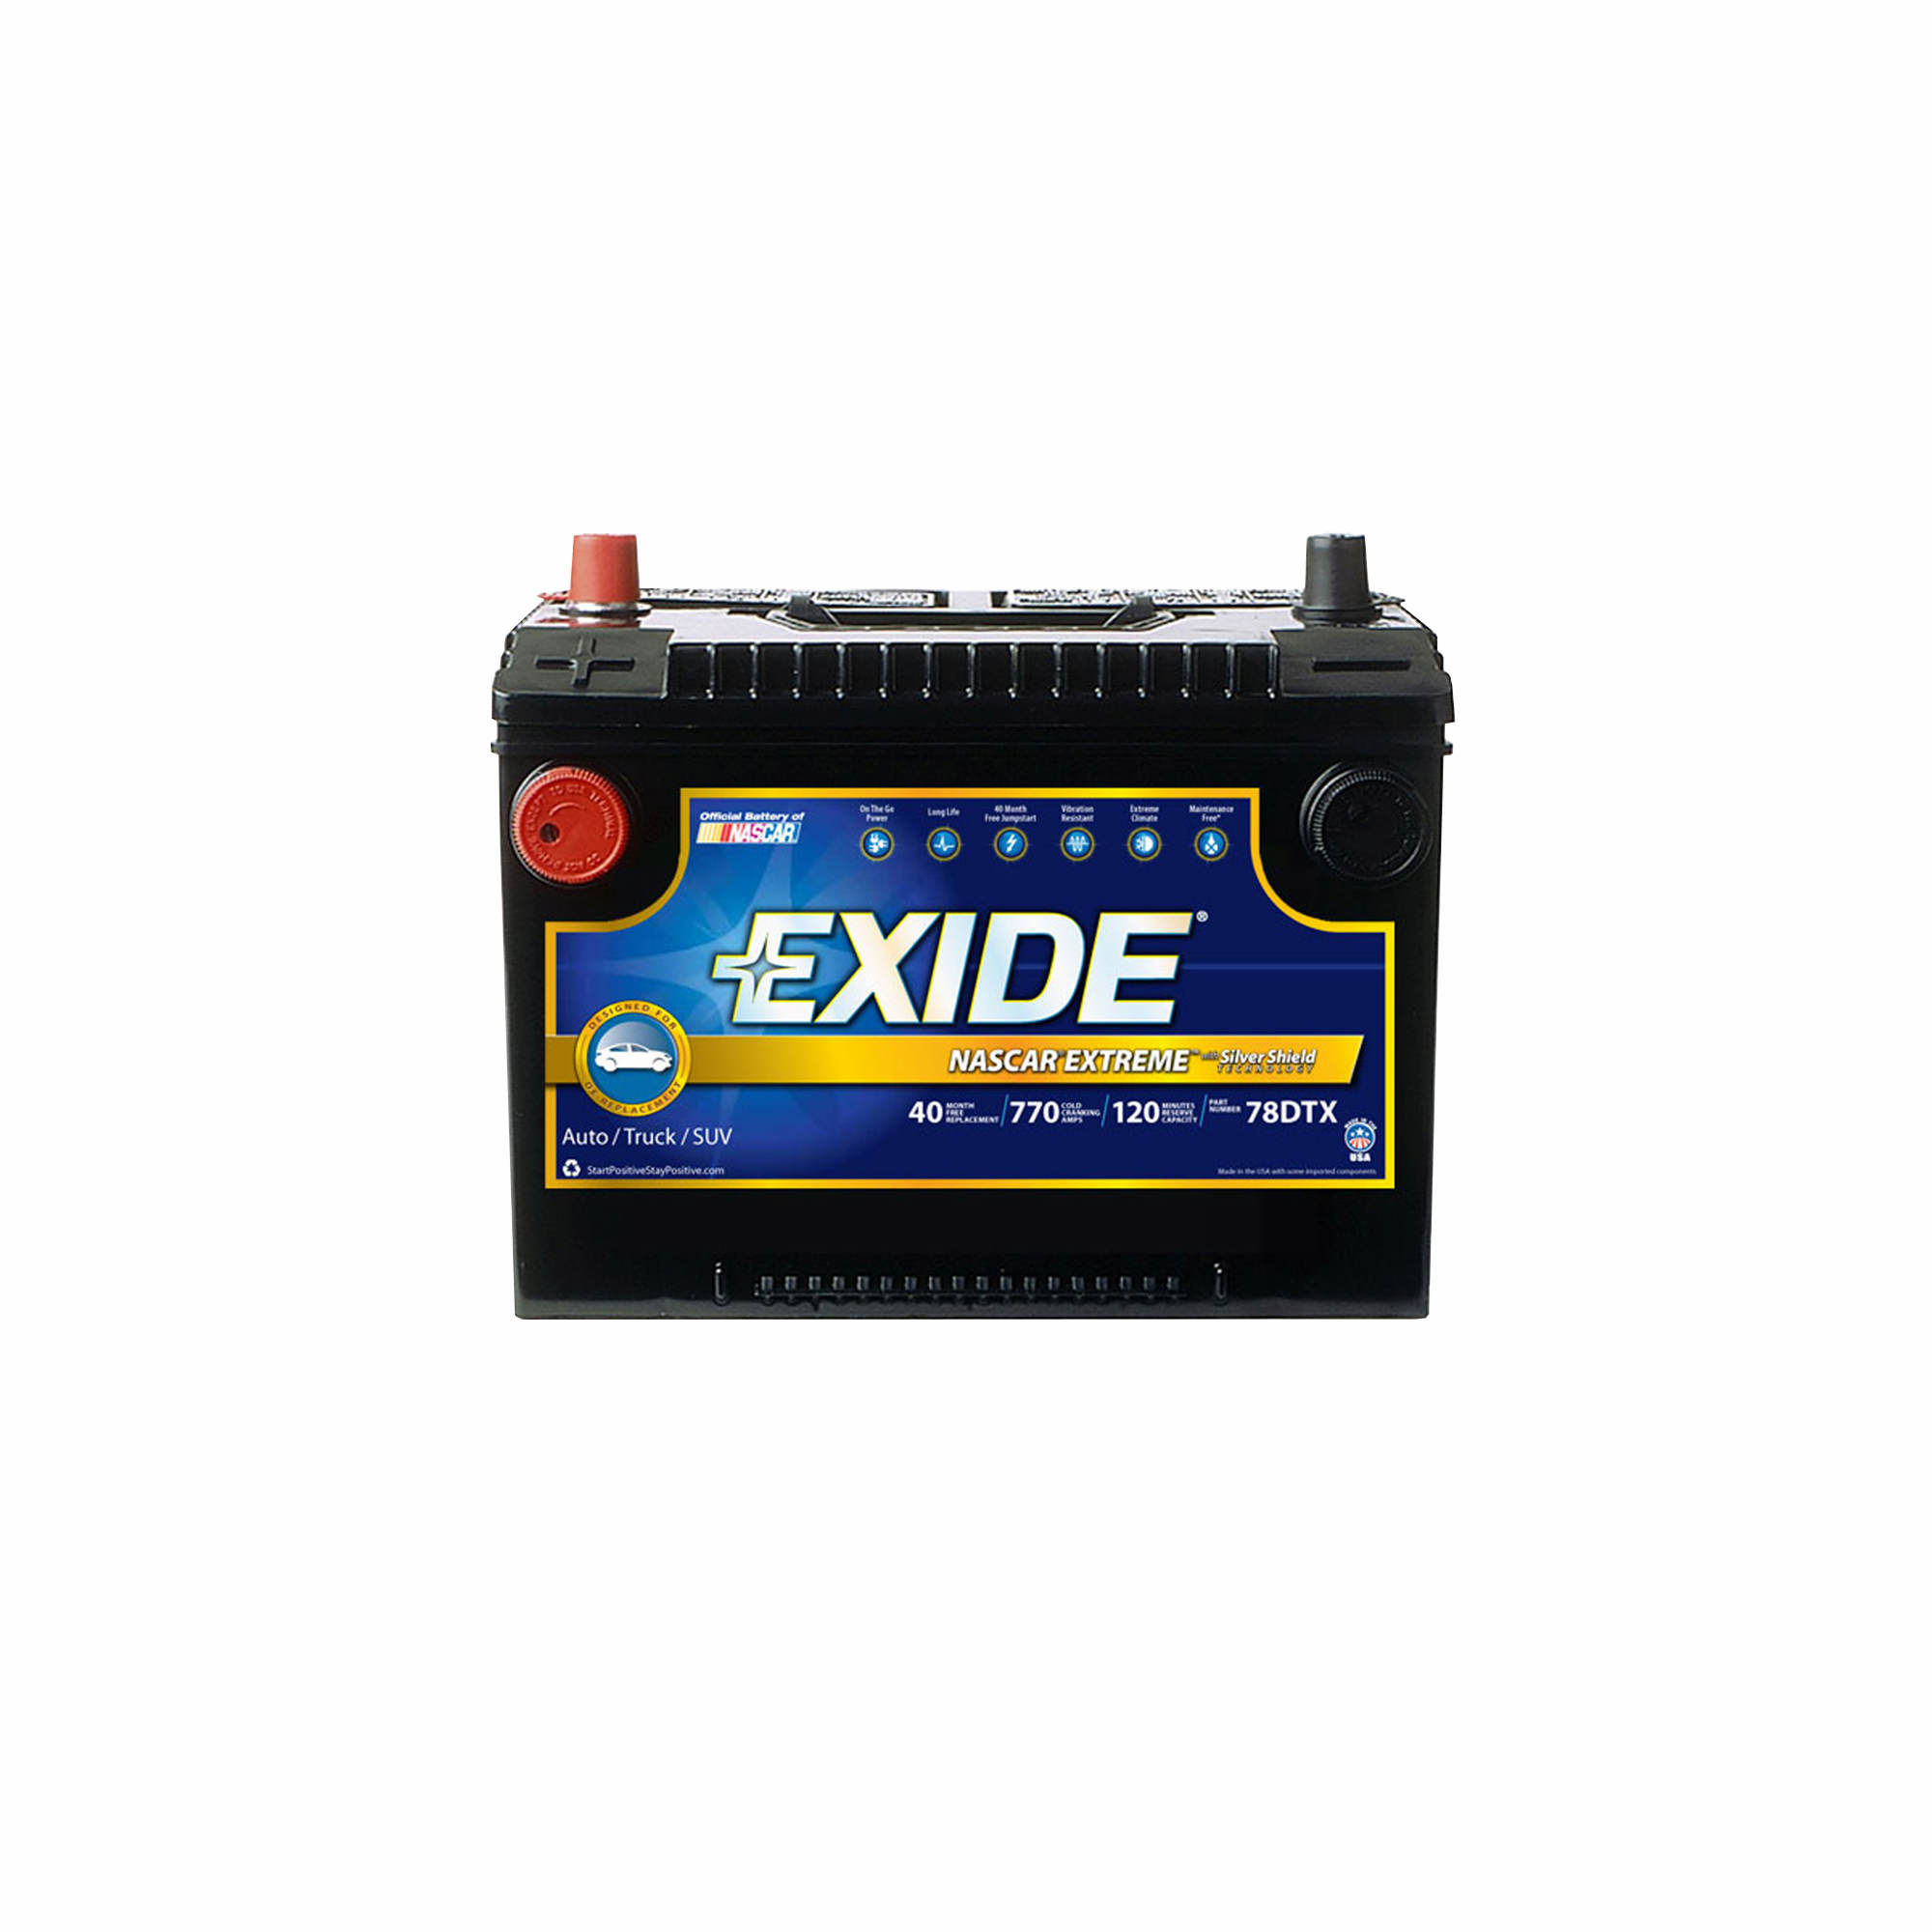 Ny honda dealer new york new amp used car newspaper ad riverhead - Exide Premium Extreme Nascar 78dtx Auto Battery